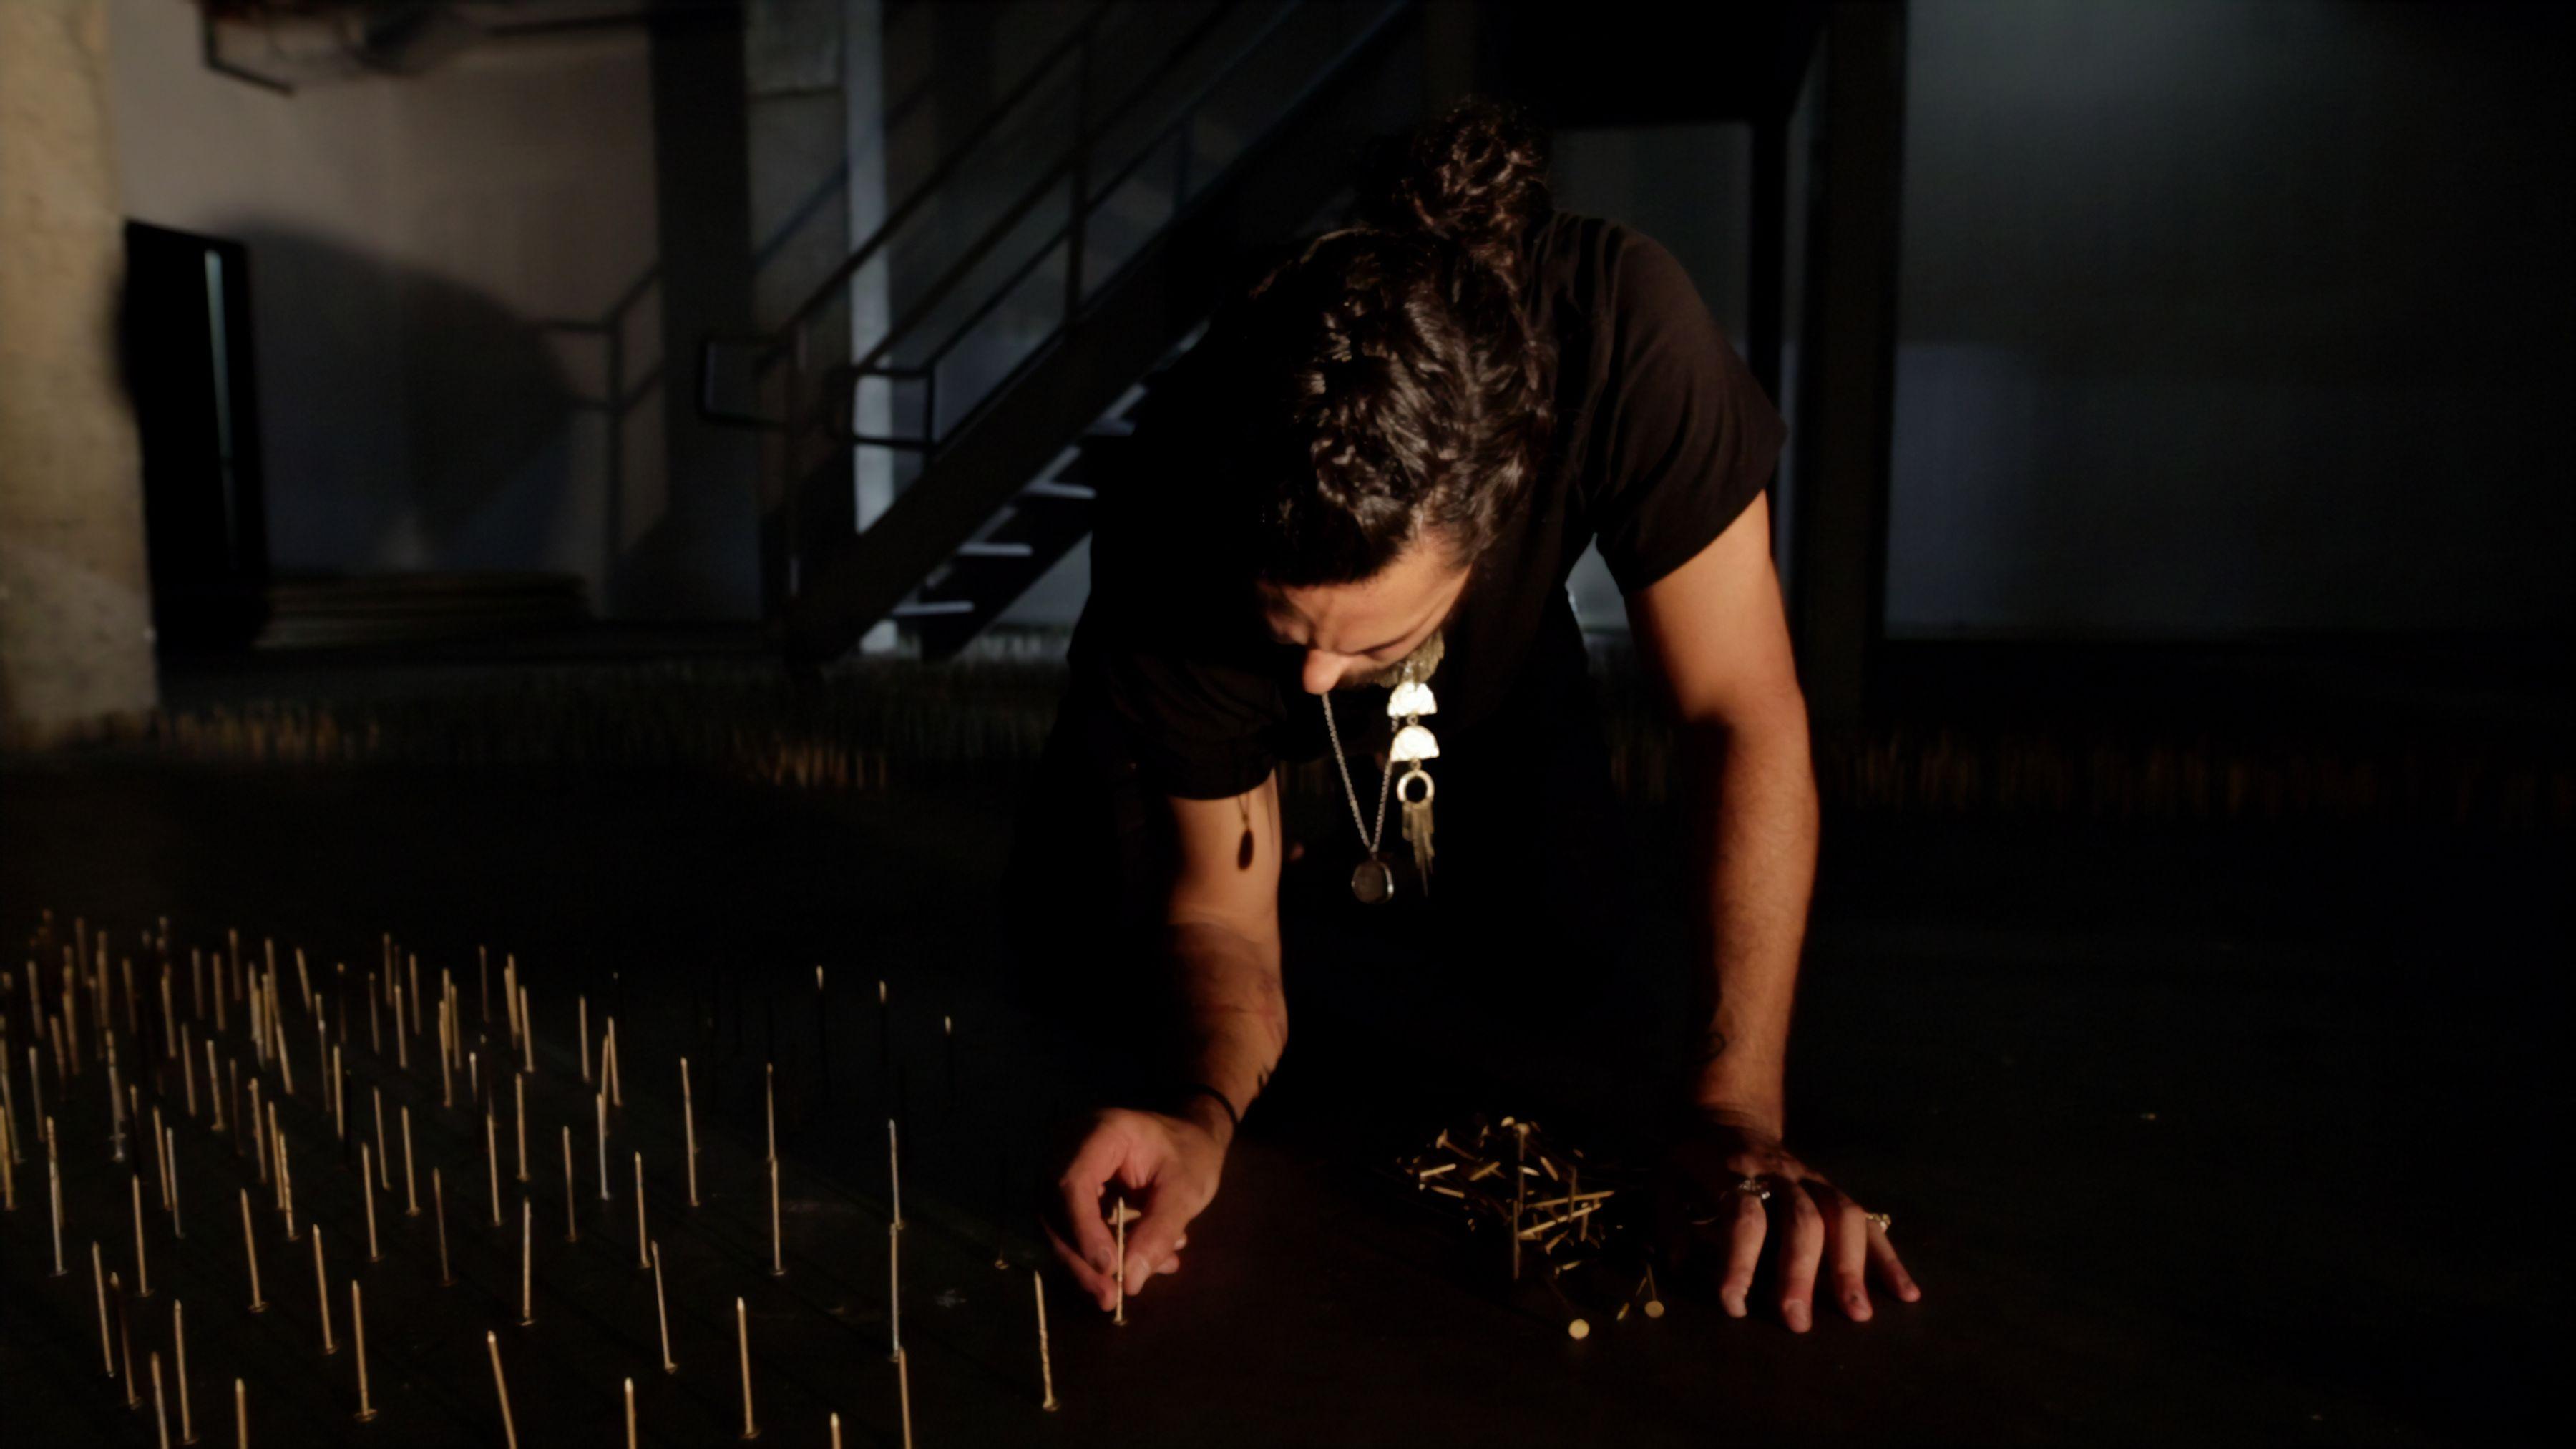 Image of artist making Rebirth Franz Klainsek at Hg Contemporary Williamsburg